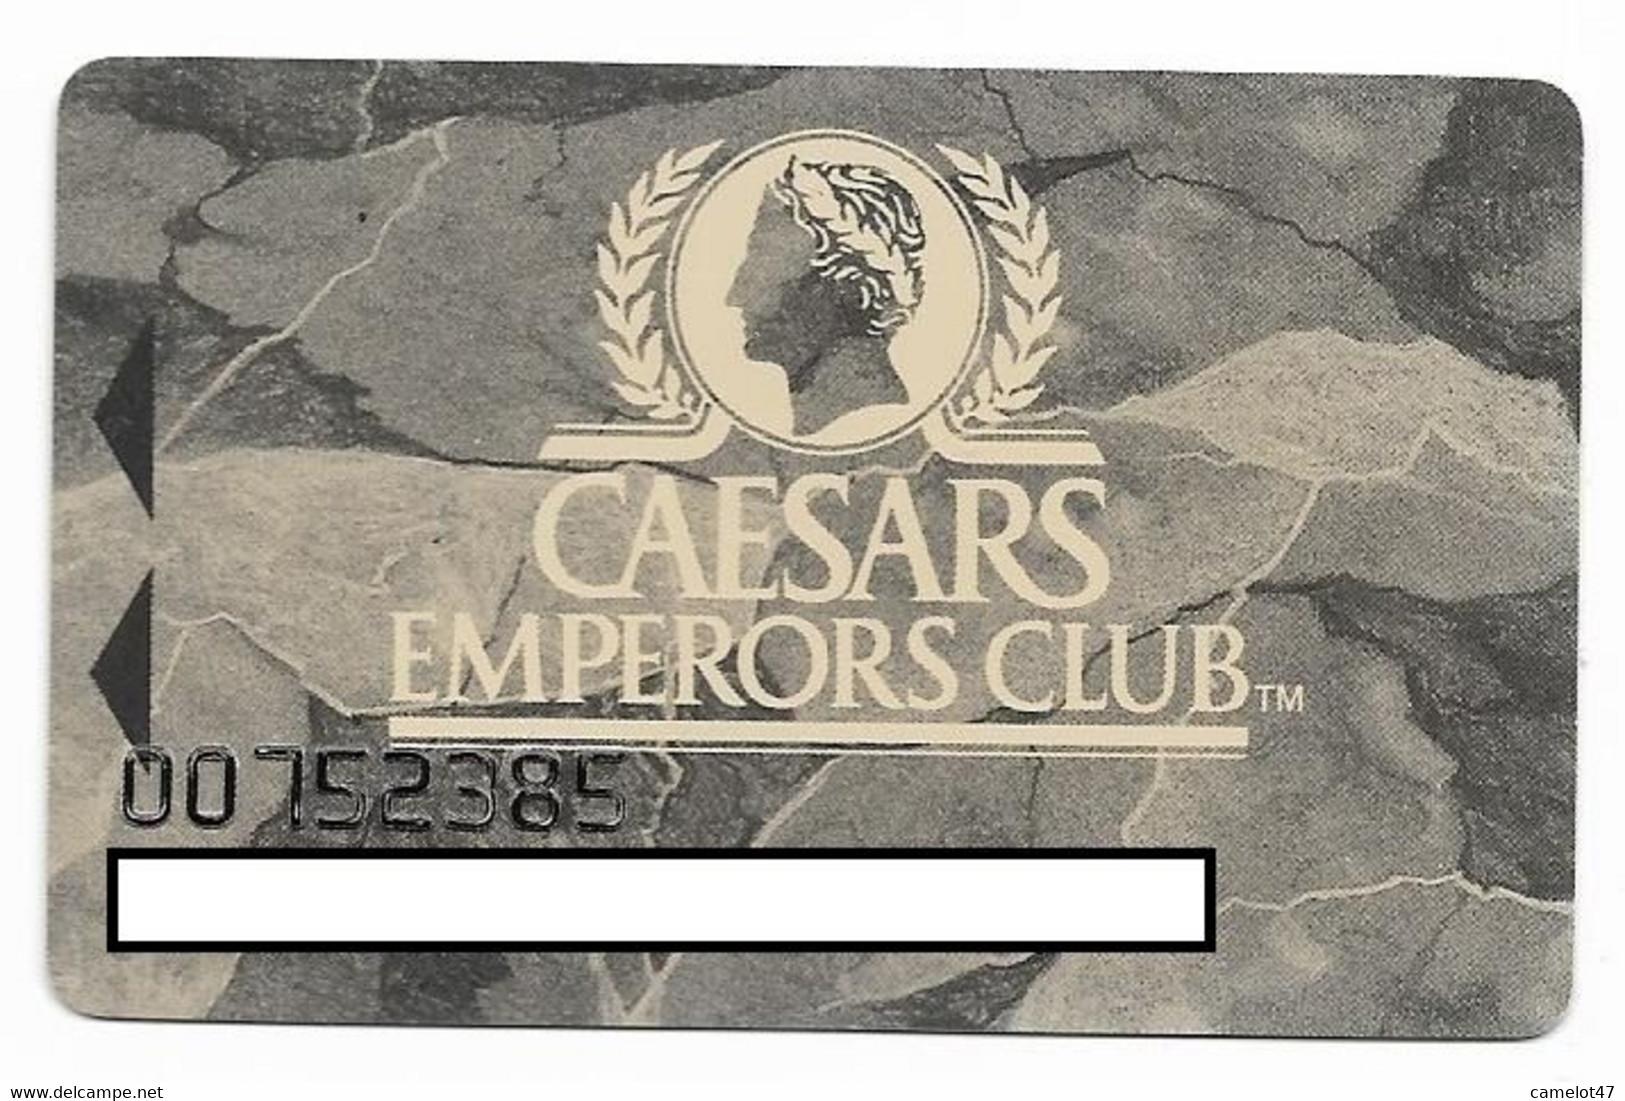 Caesars Palace Casino,Las Vegas, Older Used Slot Or Player's Card, # Caesars-3 - Casino Cards